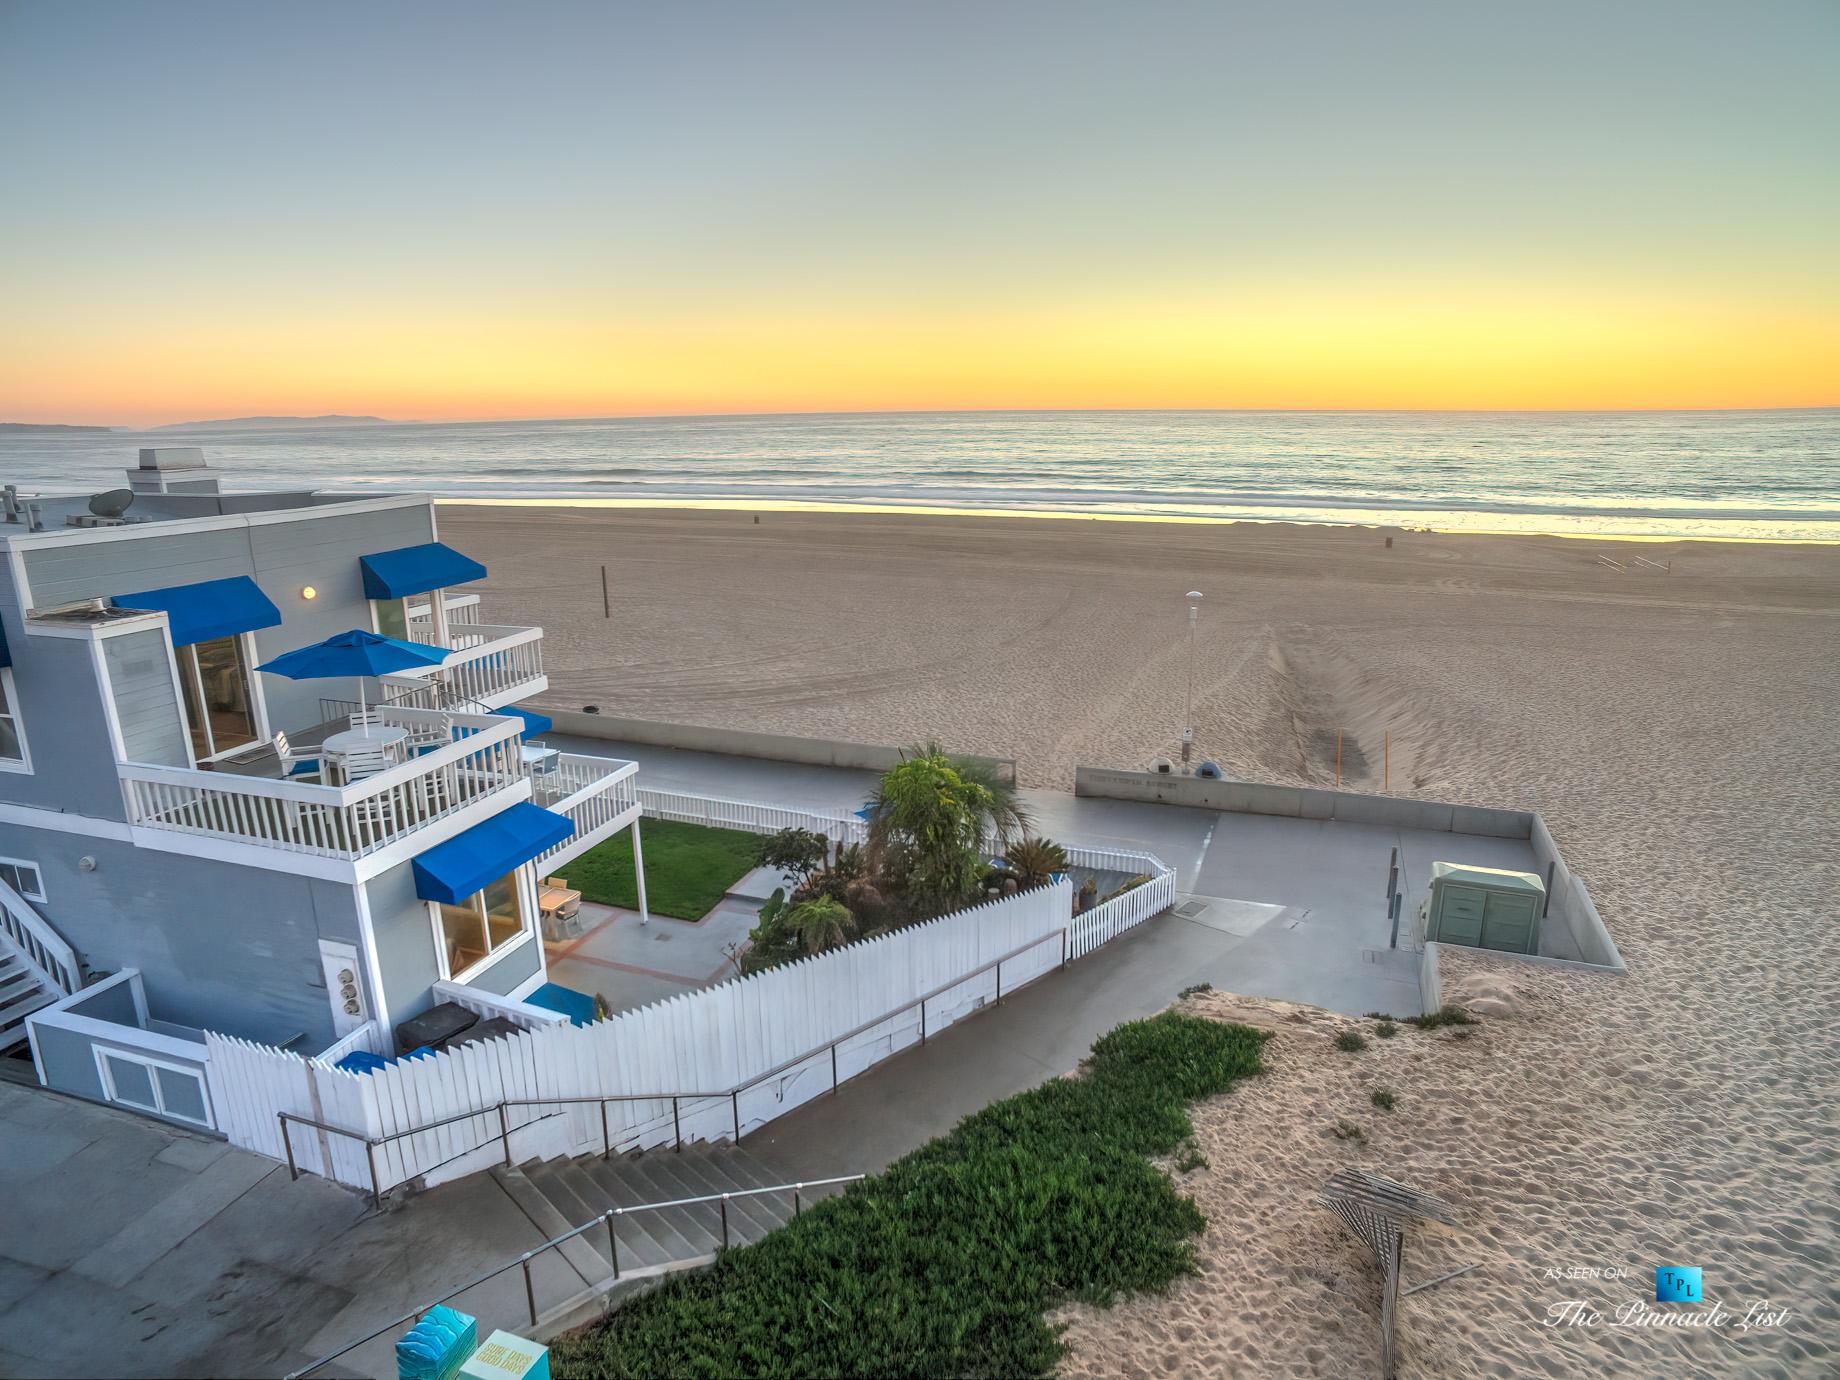 3500 The Strand, Hermosa Beach, CA, USA – Sunset Beach View – Luxury Real Estate – Original 90210 Beach House